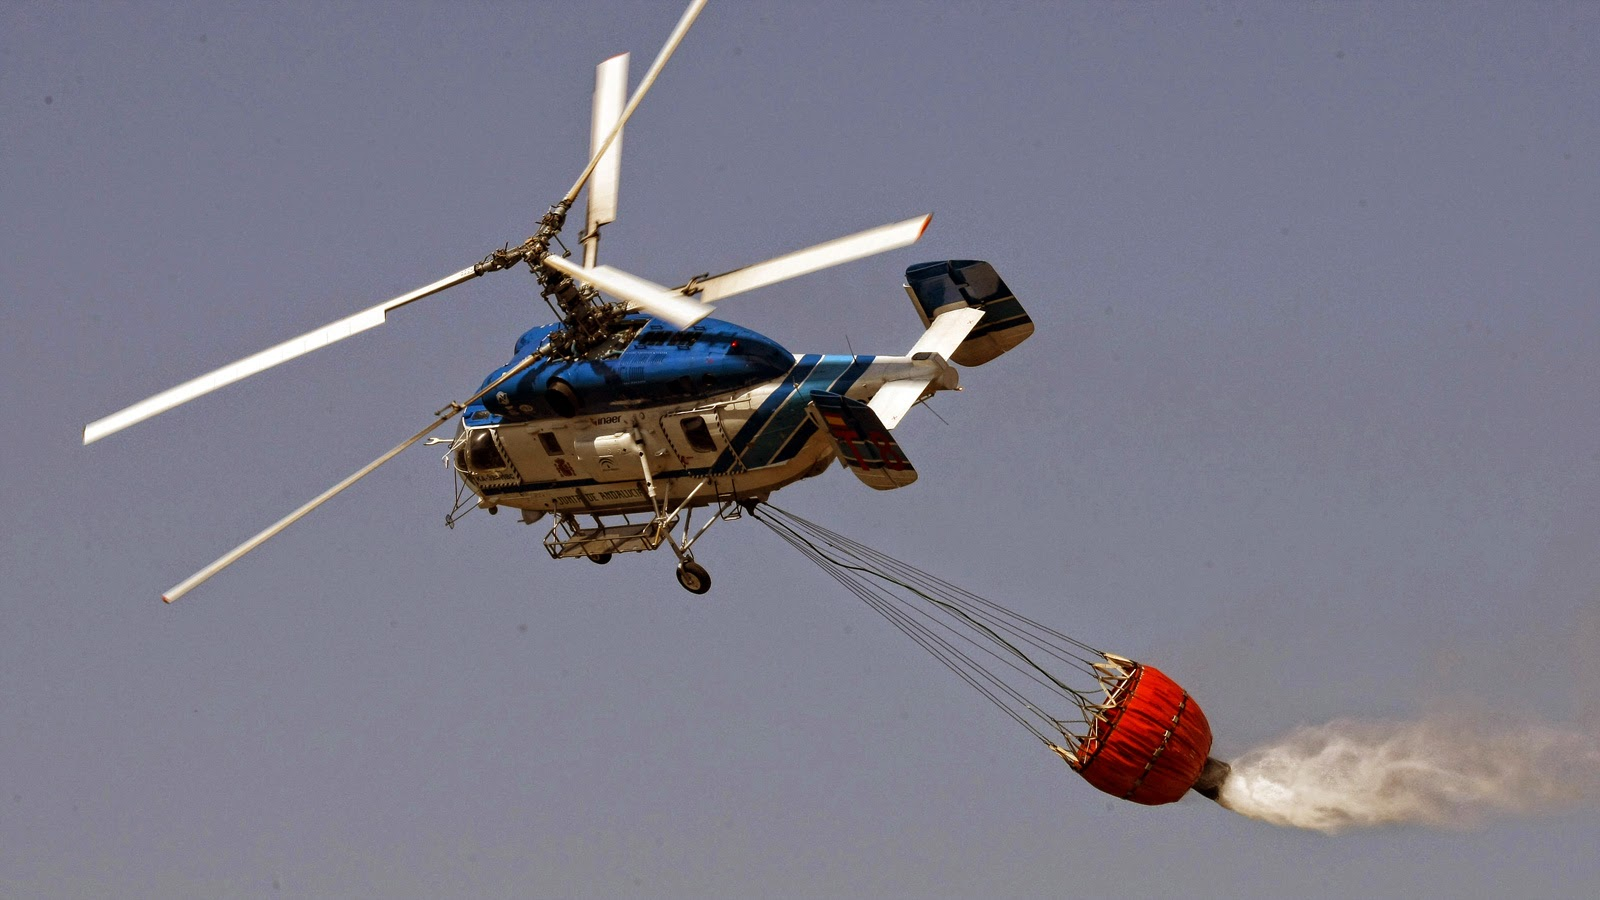 Elicottero Ka 32 : Sheepo s garage kamov ka coaxial helicopter